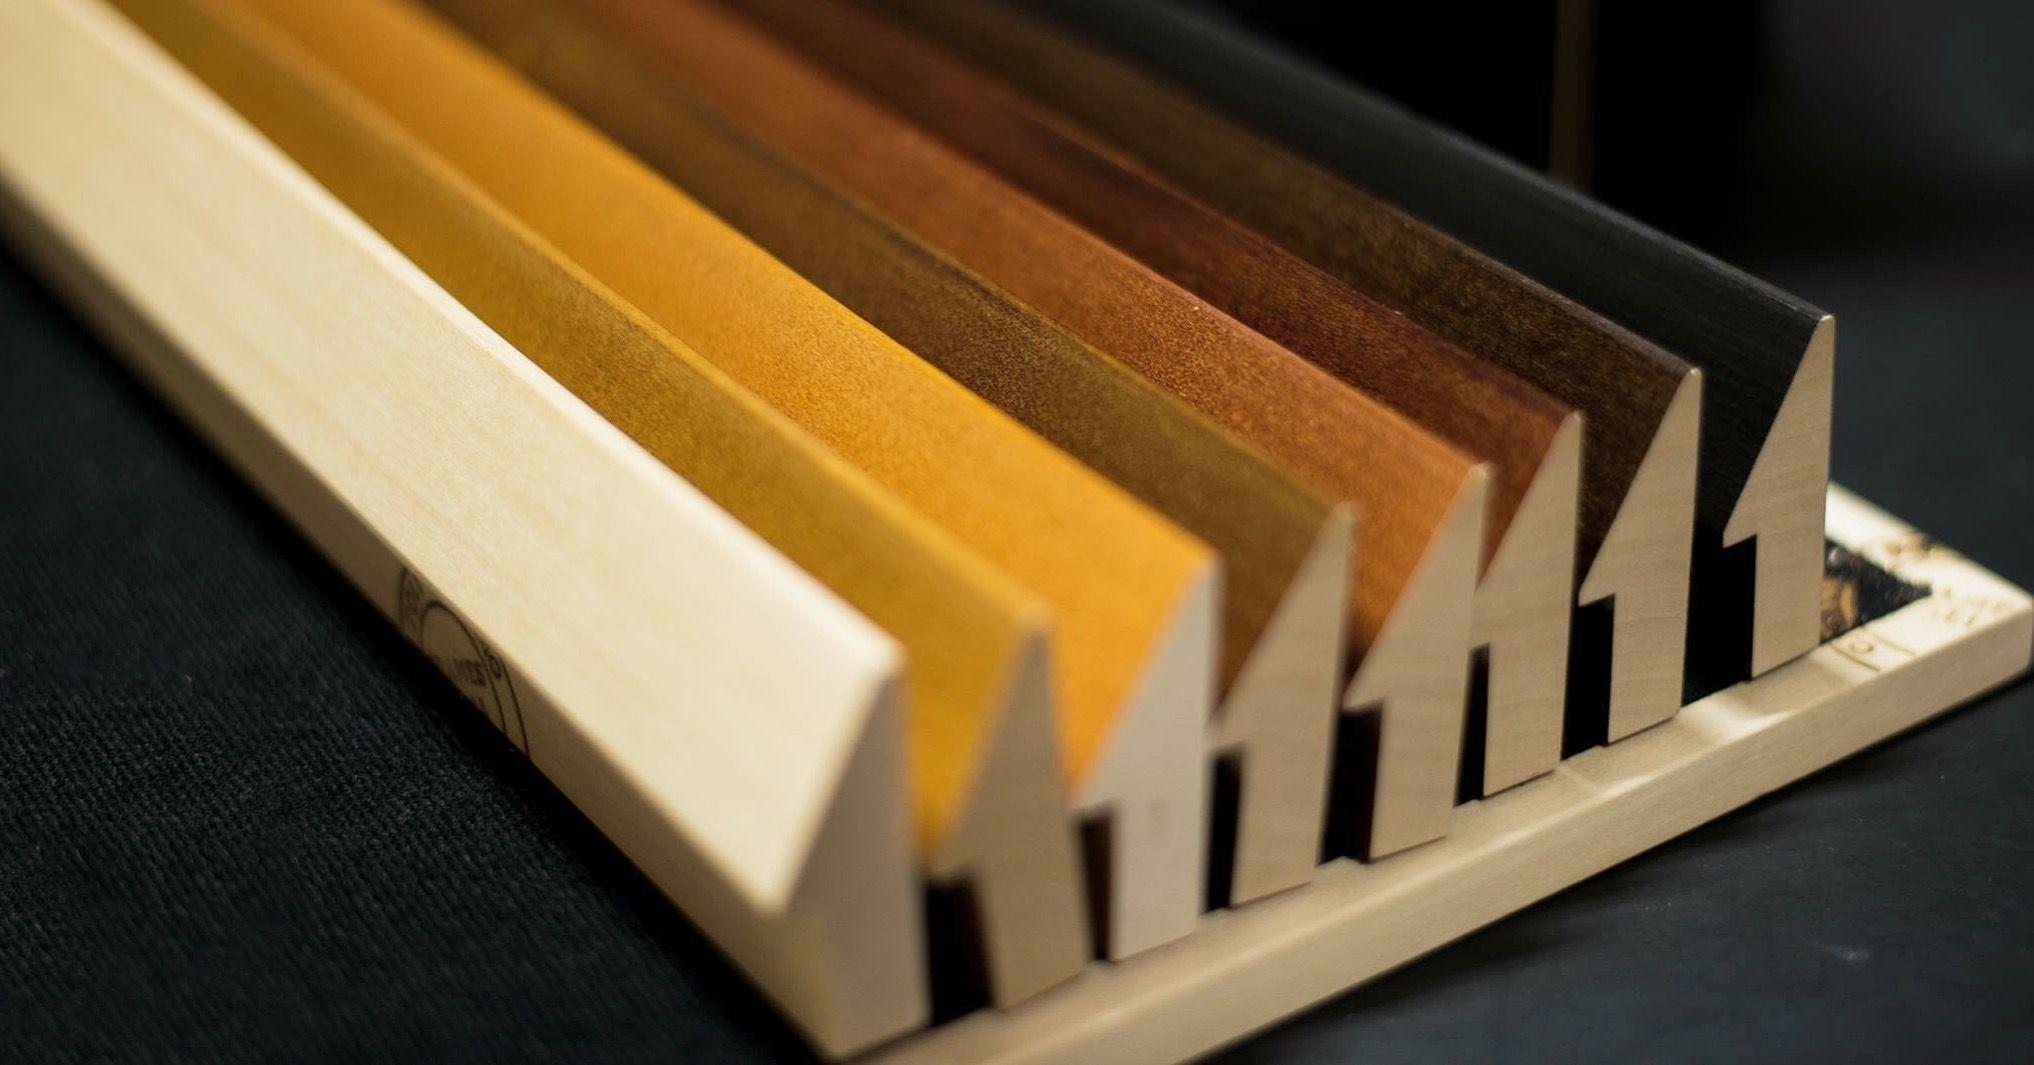 I colori caldi del legno. wood retus aste